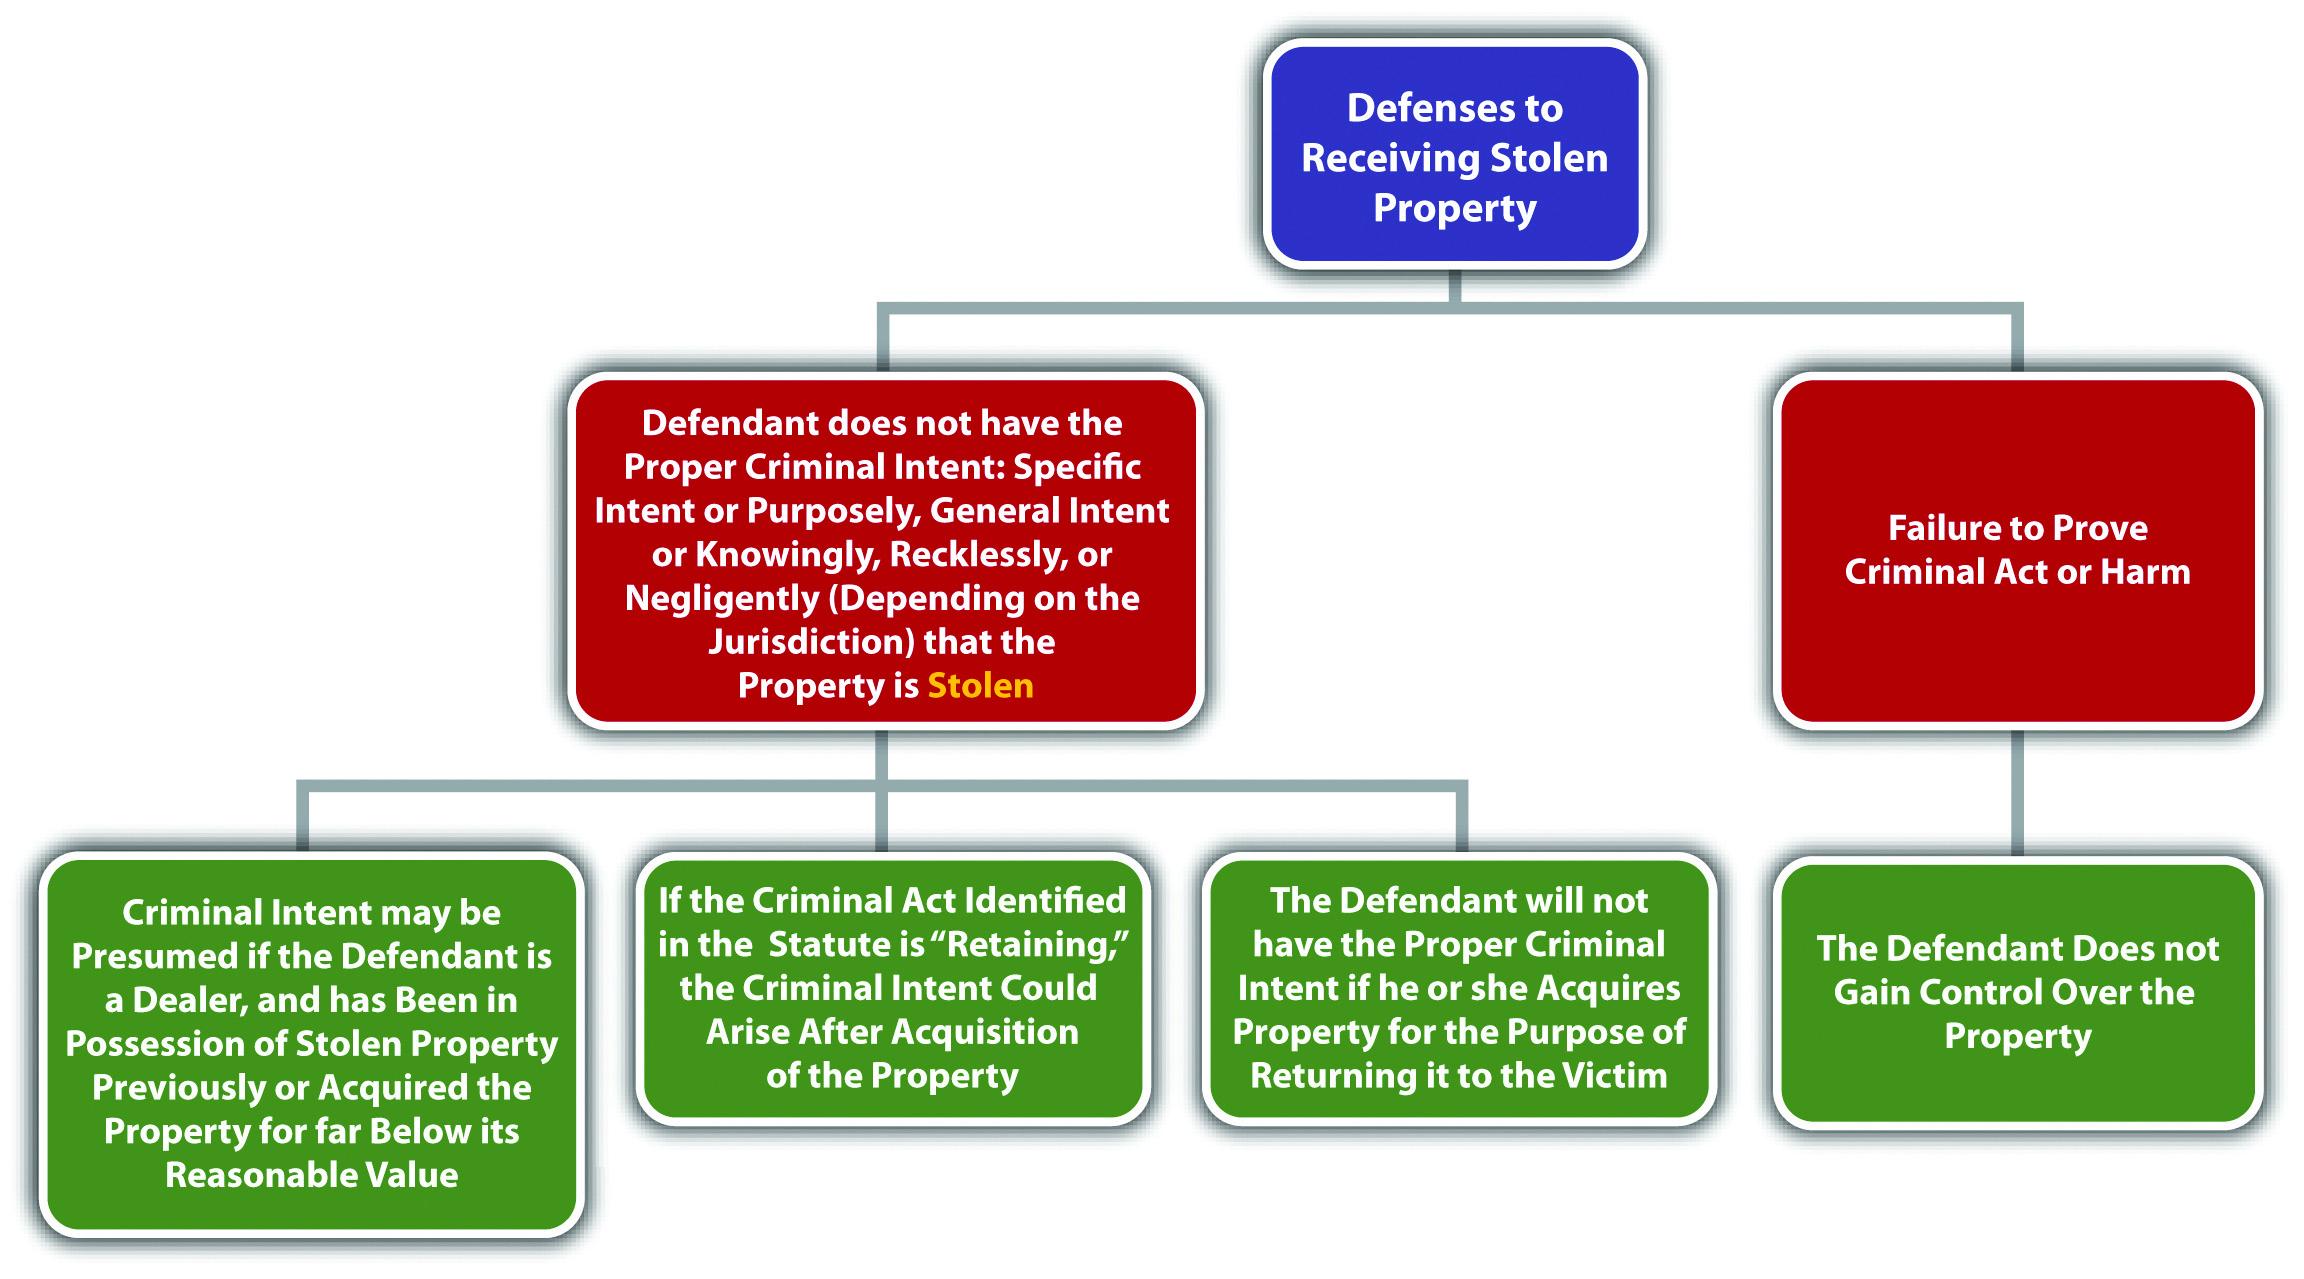 Diagram of Defenses to Receiving Stolen Property